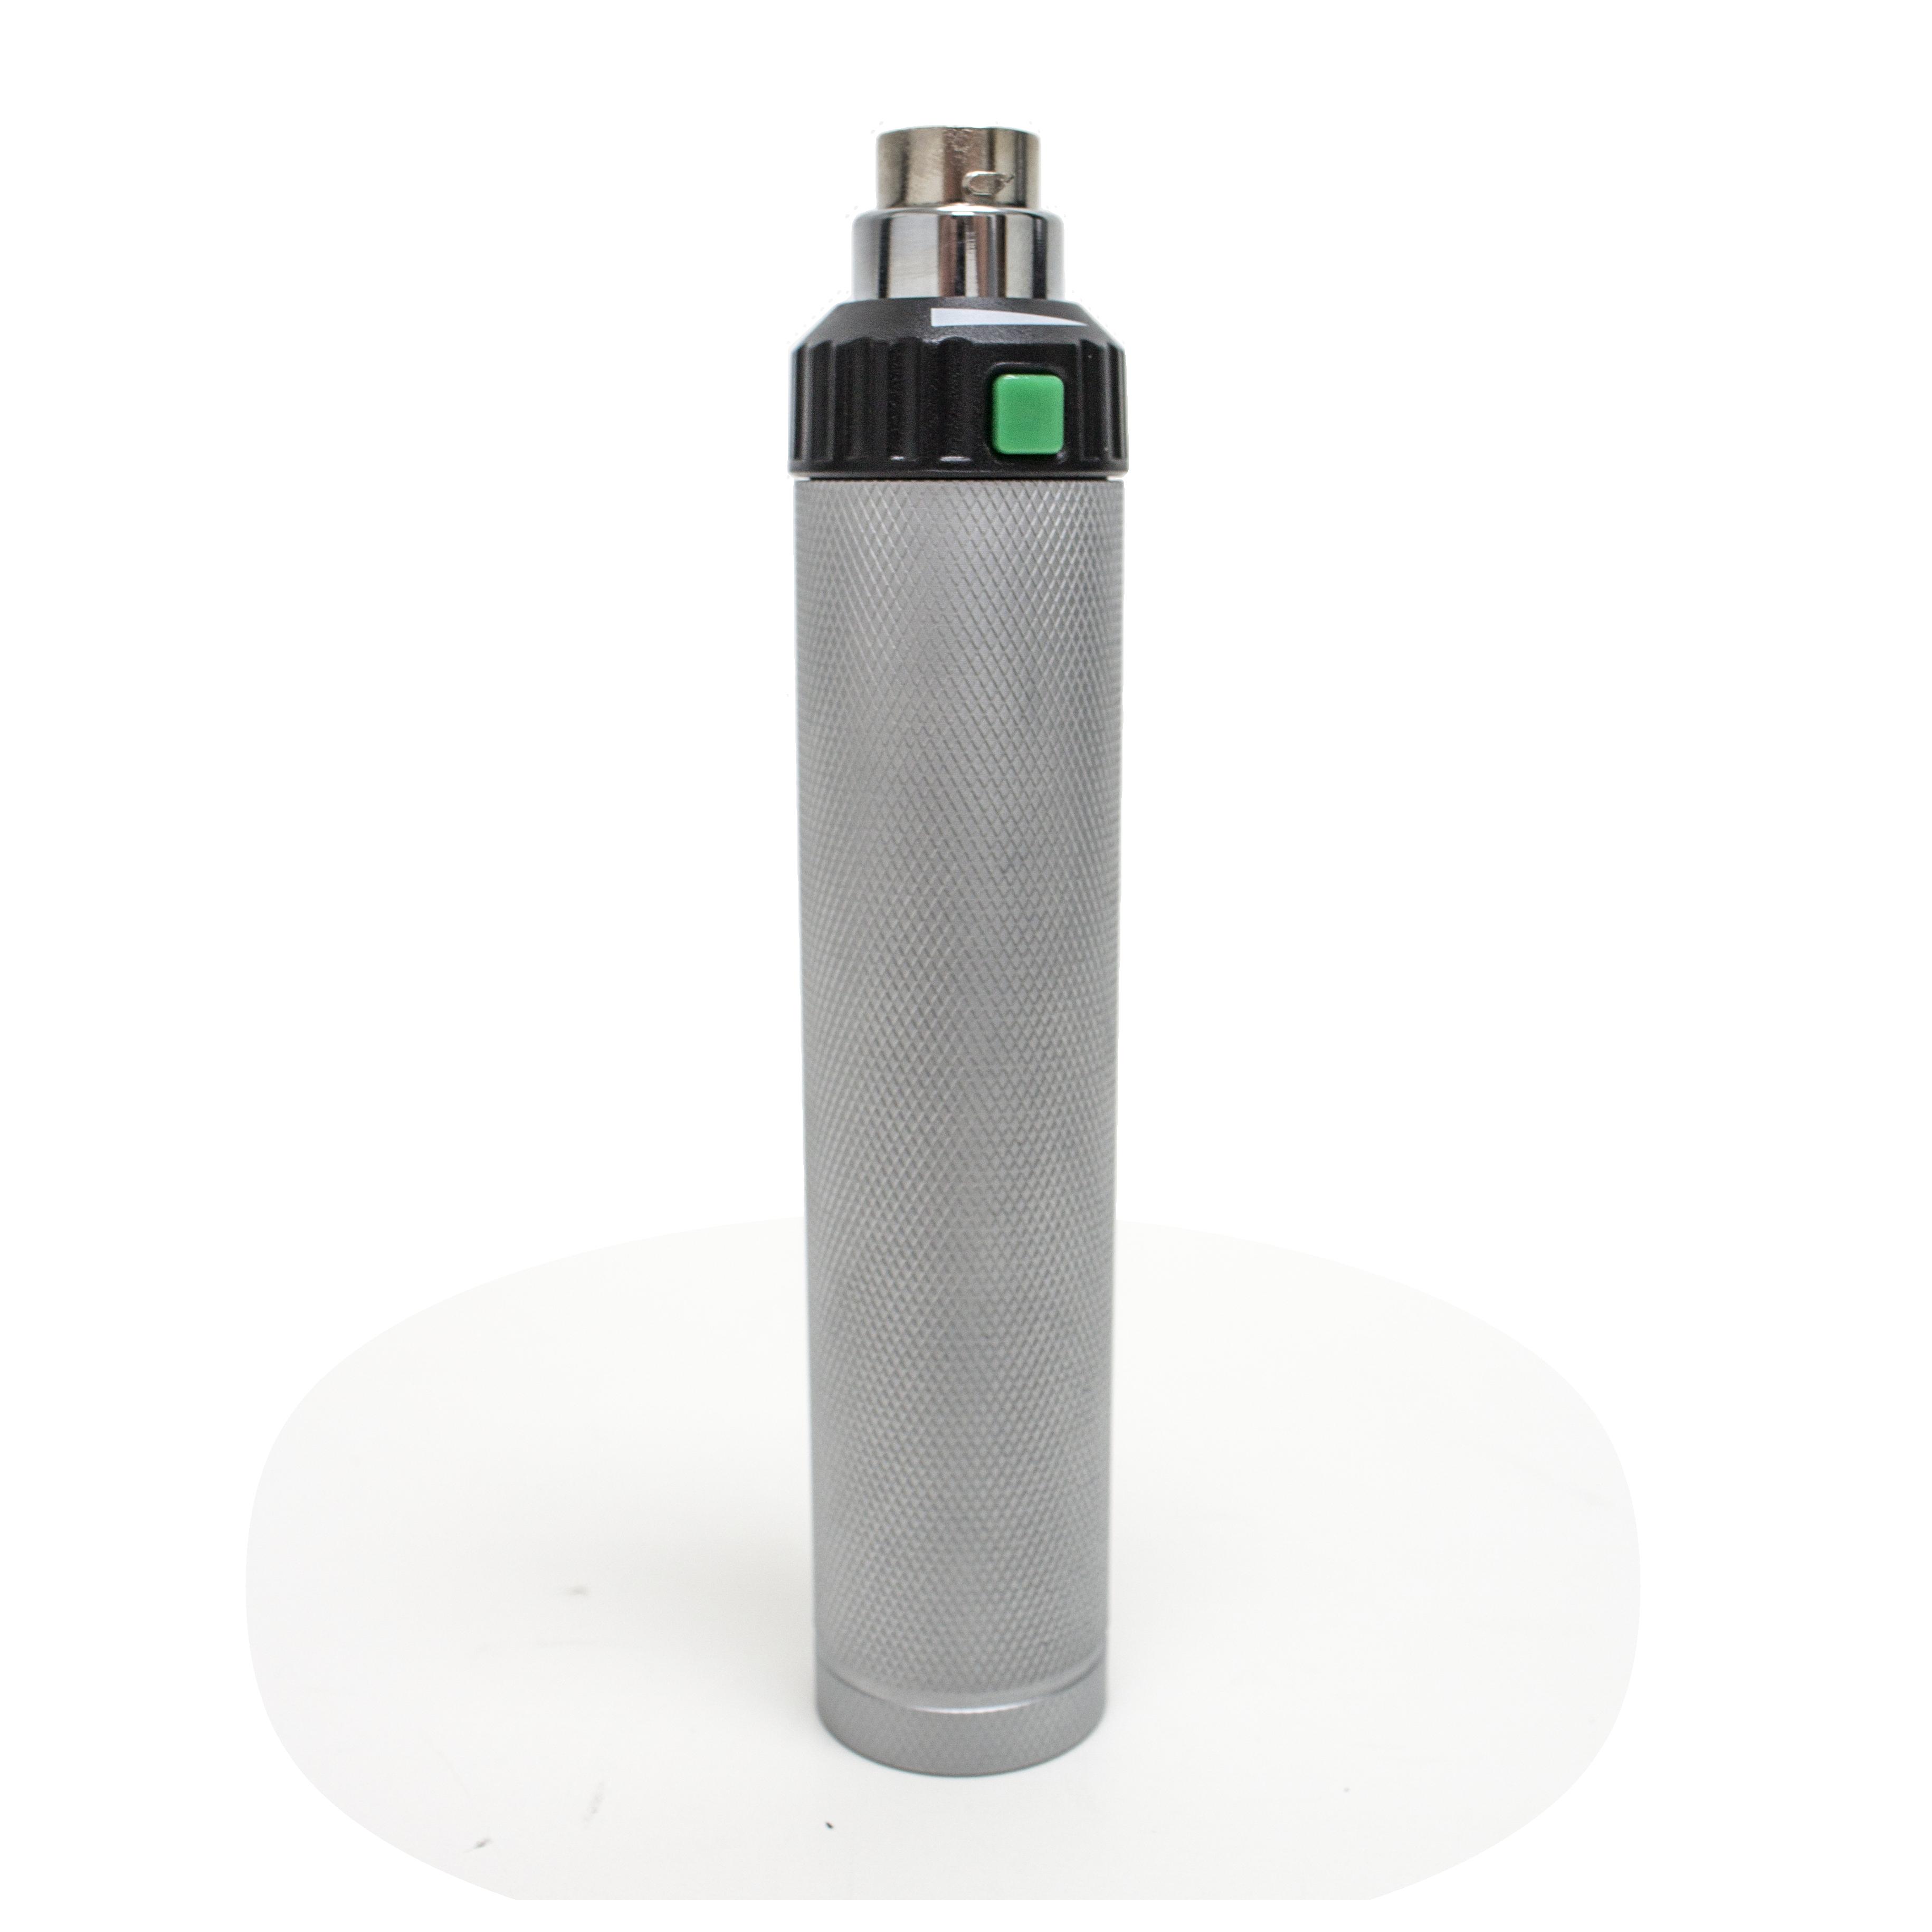 Retinoscope Handle with 72200 Battery